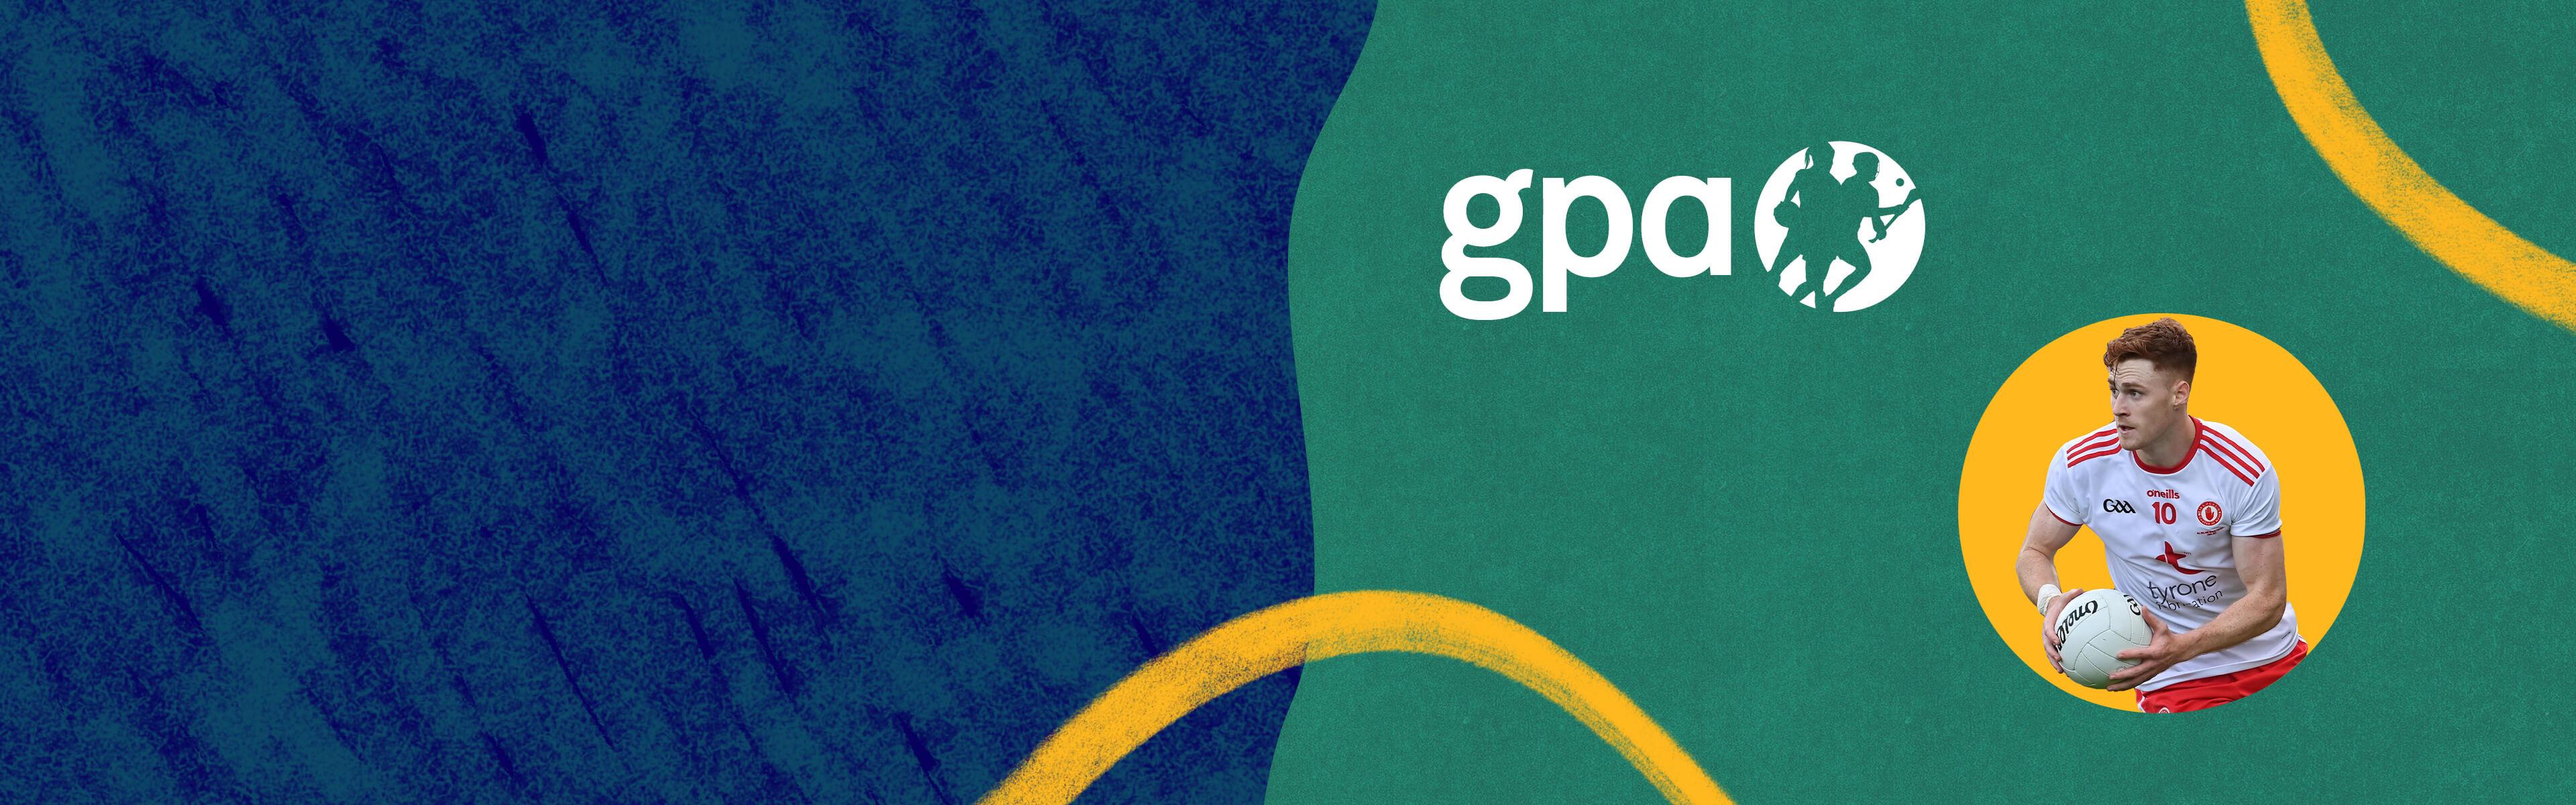 SilverCloud_Template_2021_Banner_GPA_Blog